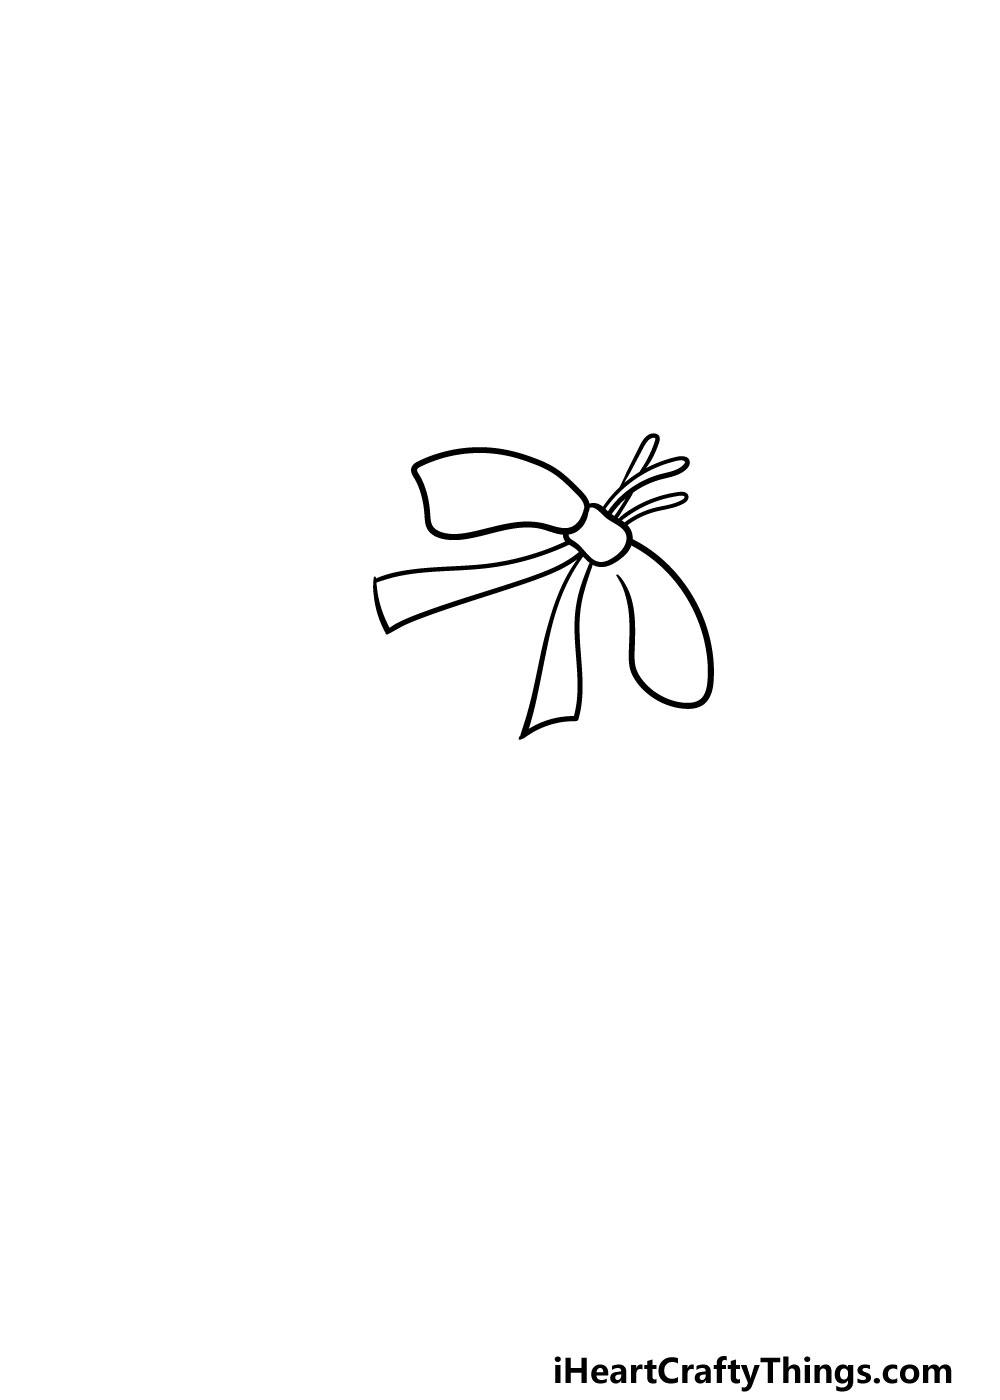 drawing a mistletoe step 1